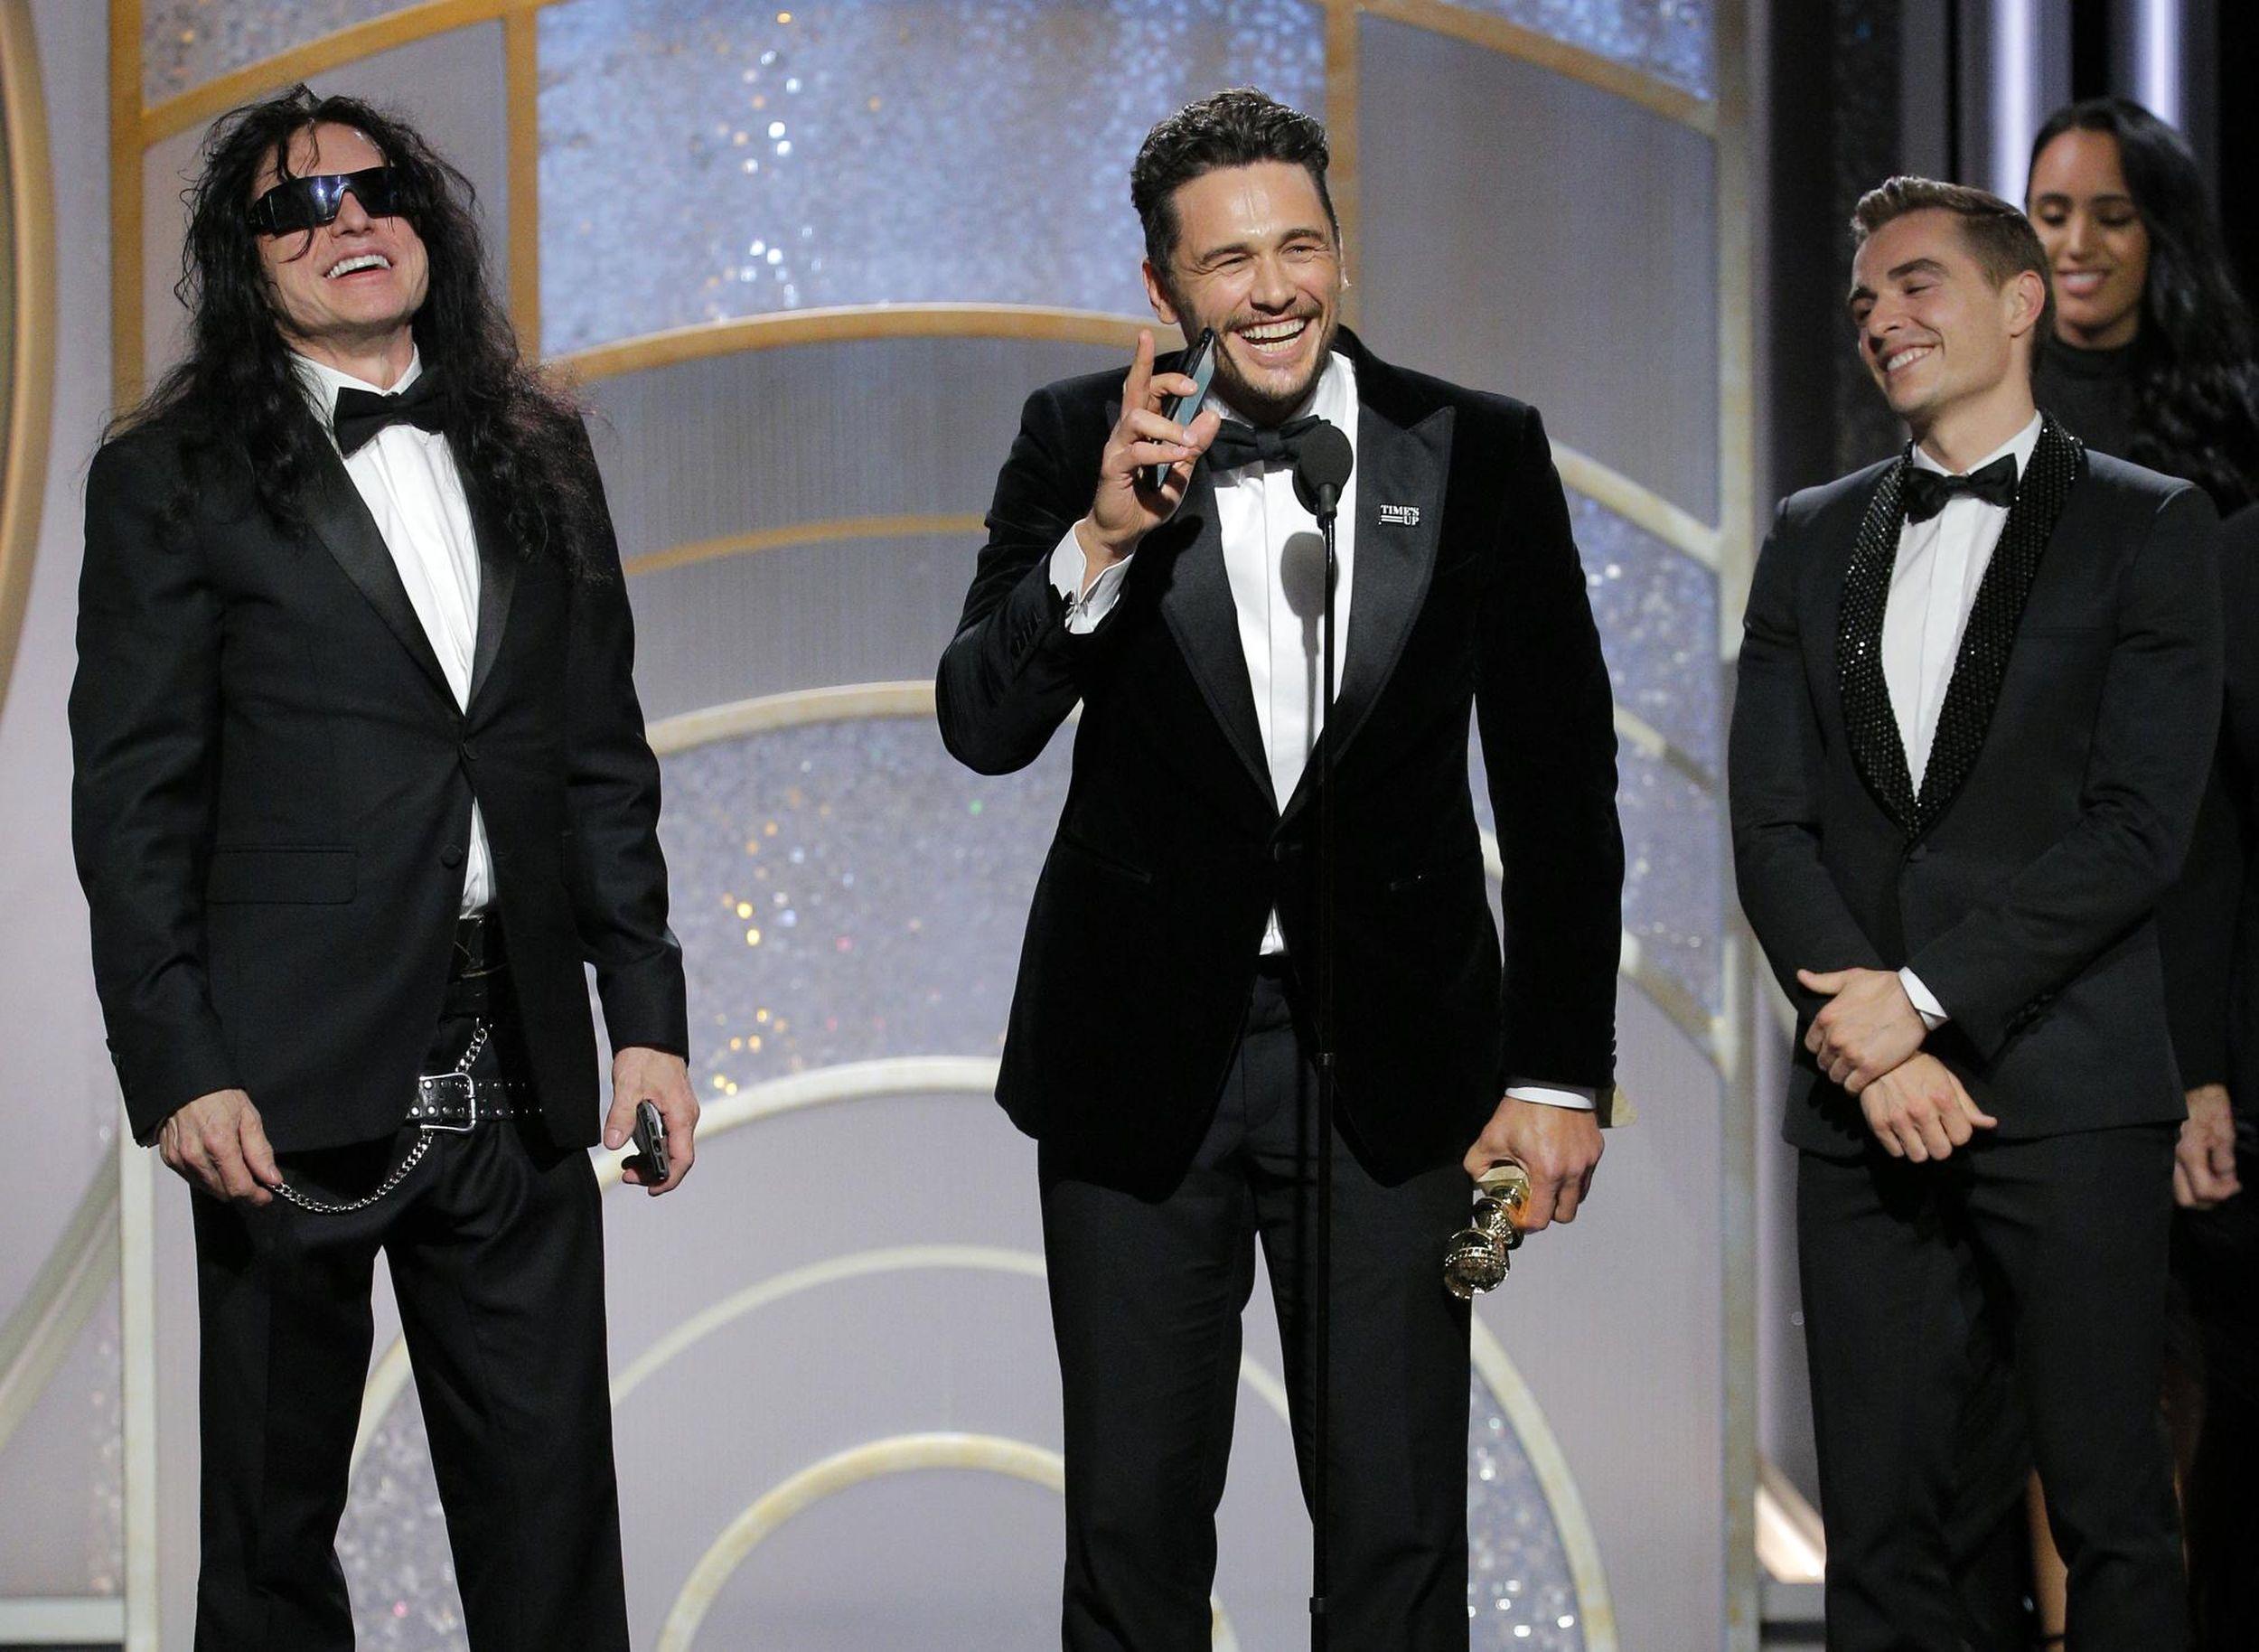 Oprah Three Billboards Triumph At Black Draped Globes The Spokesman Review